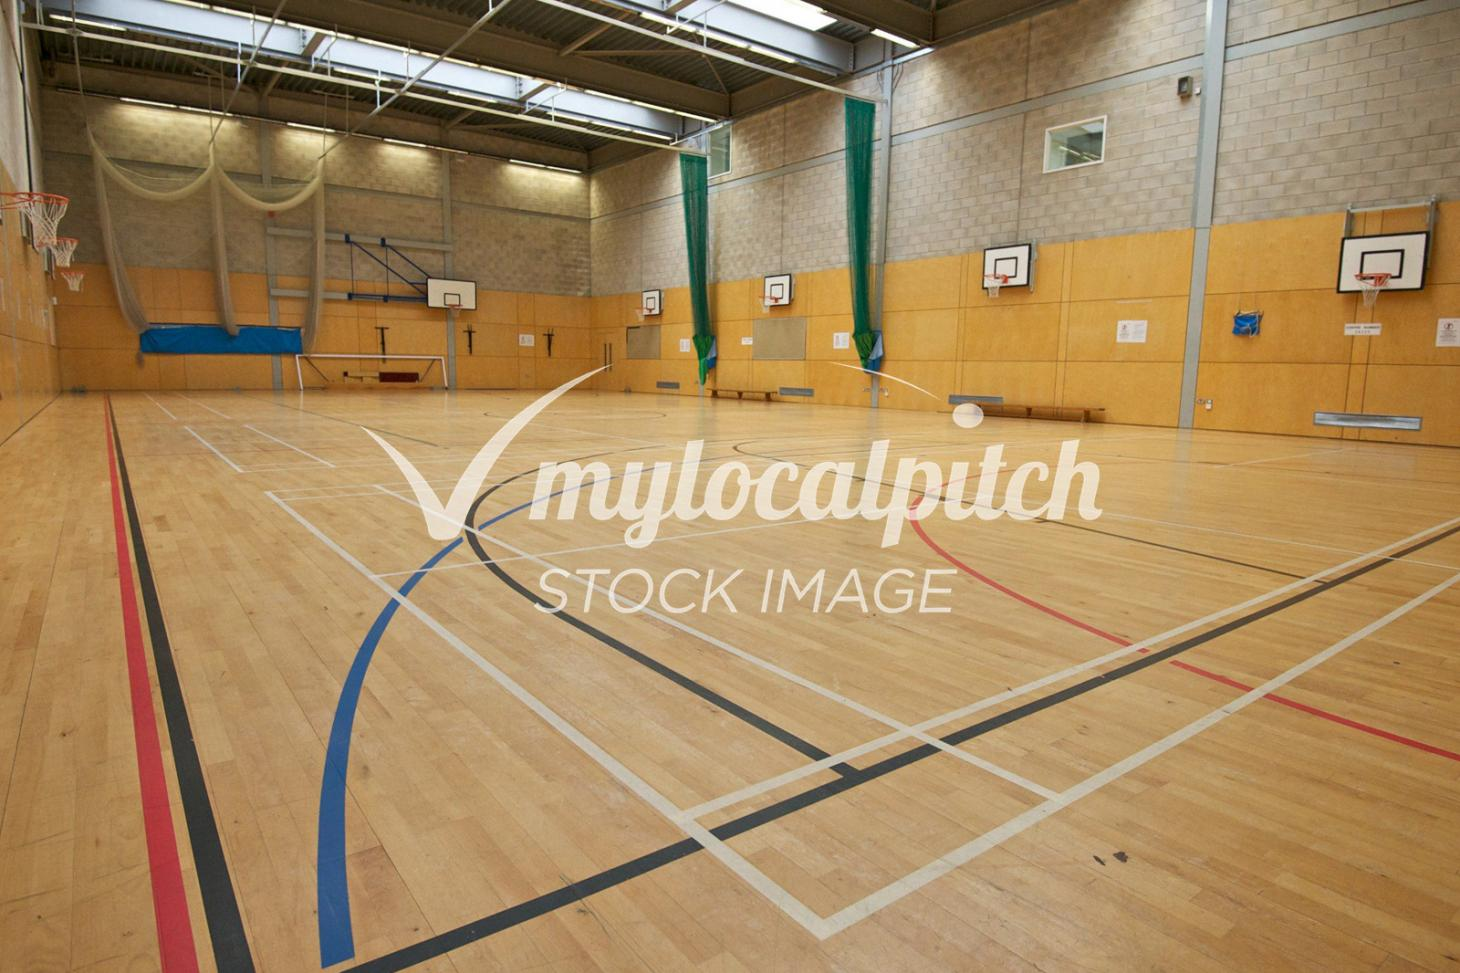 Virgo Fidelis Convent Senior School Indoor basketball court